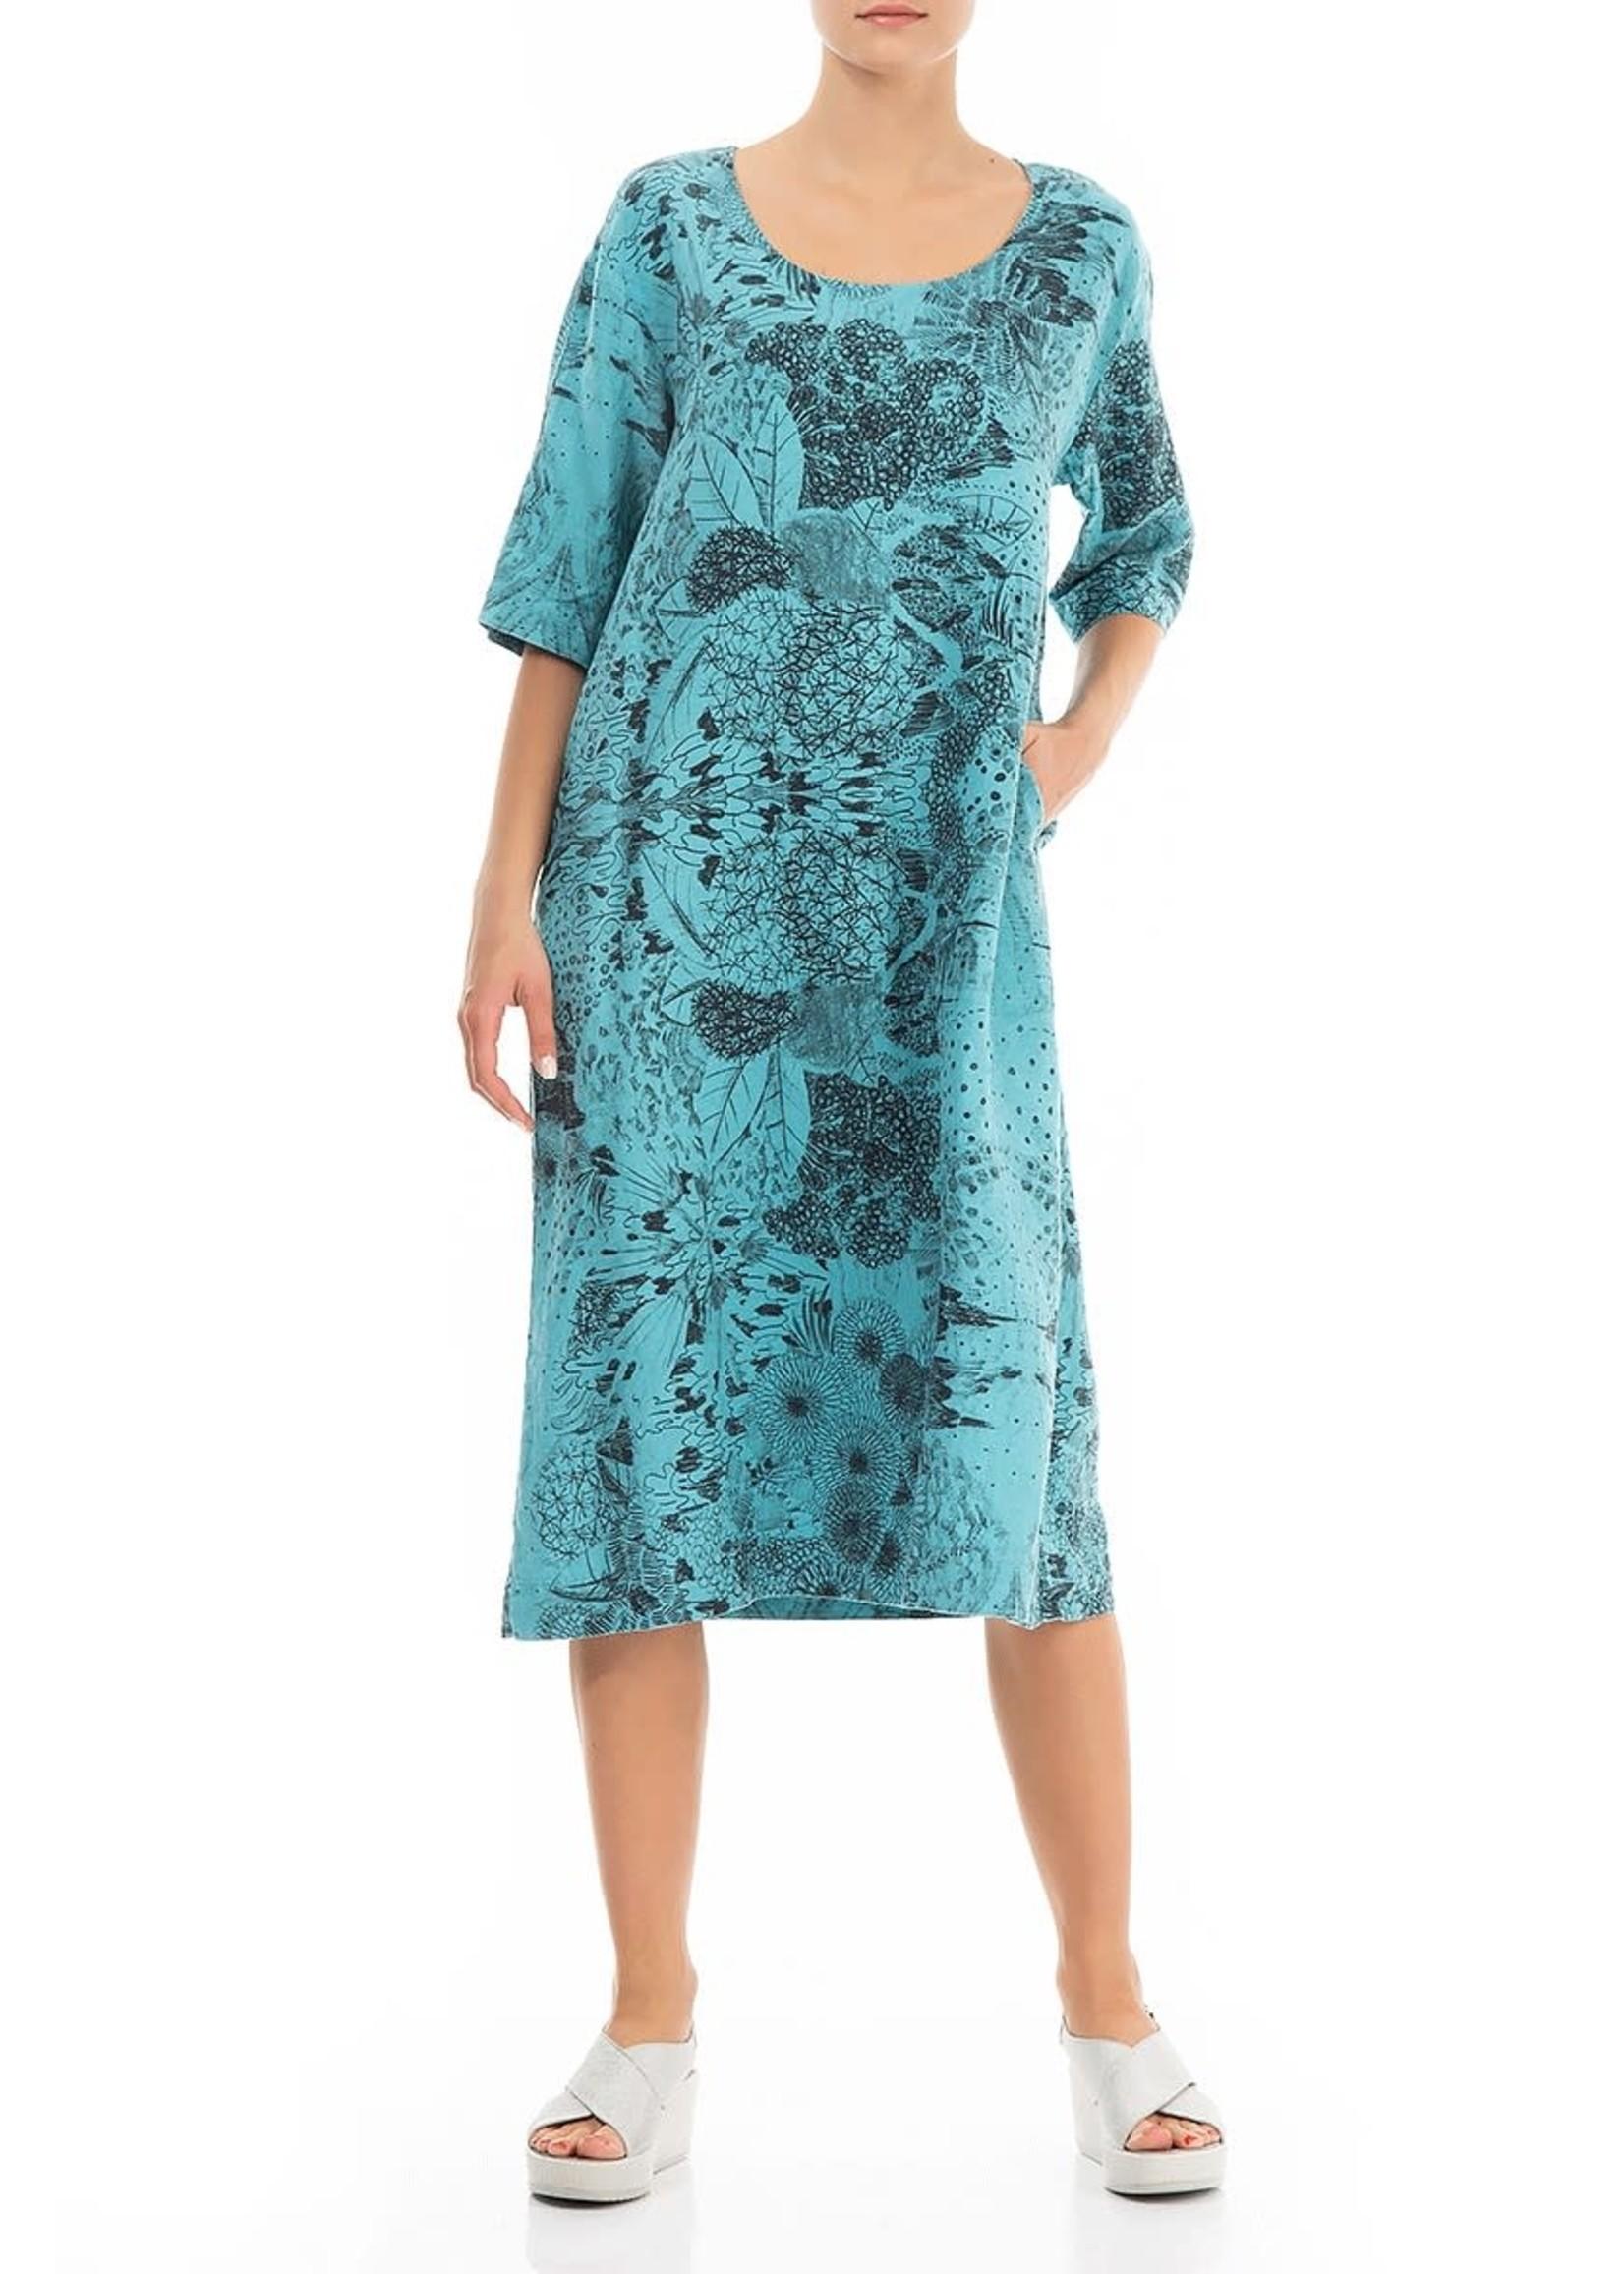 GRIZAS 91136 grizas dress